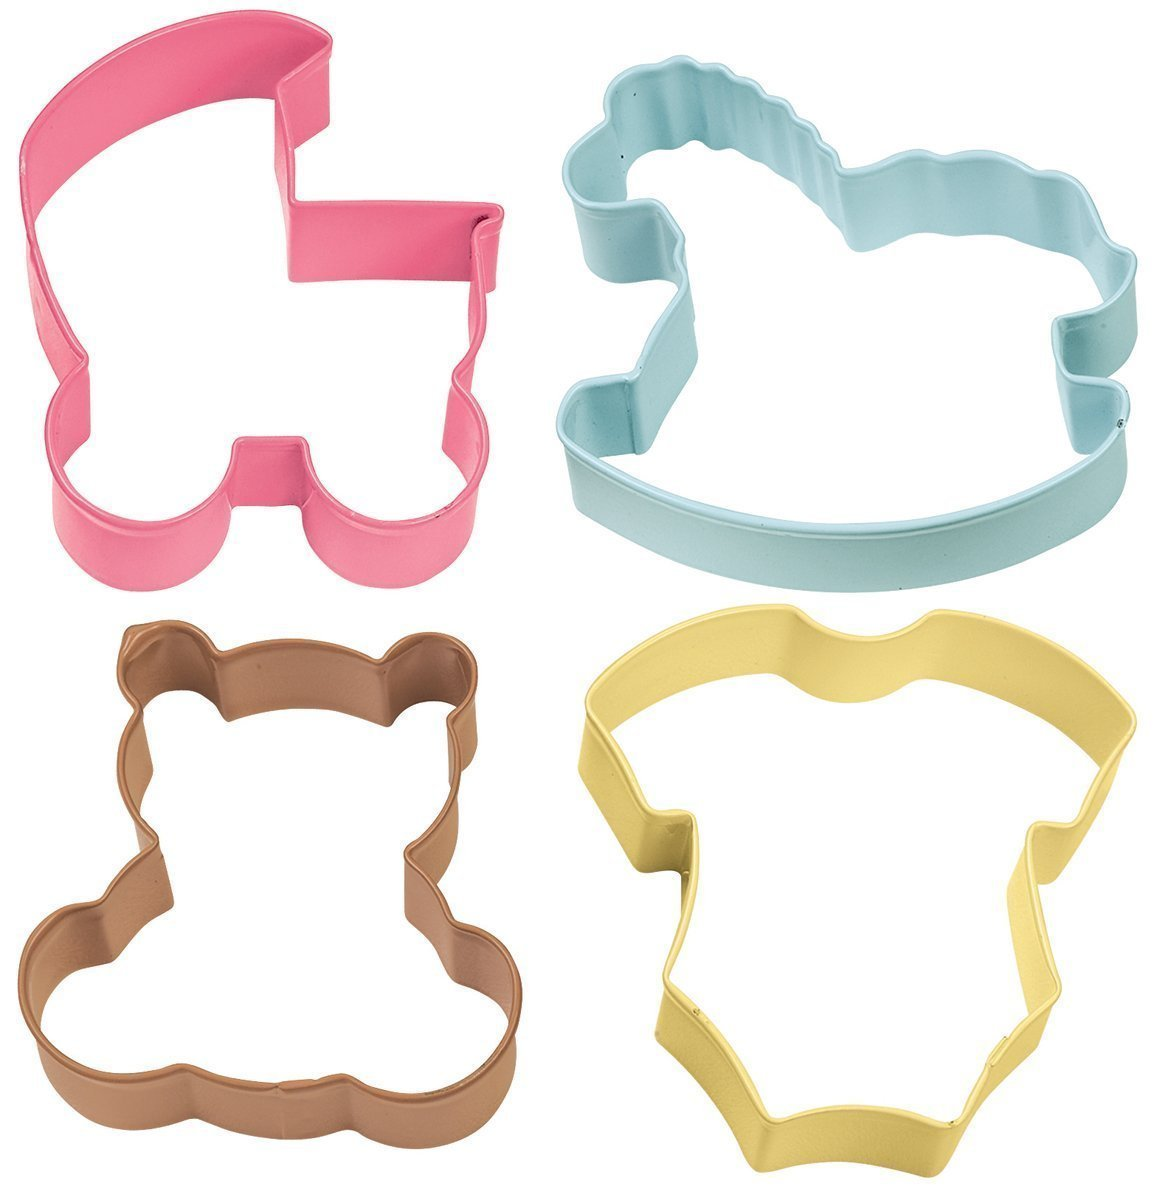 Wilton Cookie Cutter Set of 4 -BABY -PRAM, ROCKING HORSE, TEDDY, ONESIE Σετ με 4 κουπάτ -Μωρού.   Καρότσι, ζιπουνάκι, άλογο, αρκουδάκι 7.6εκ